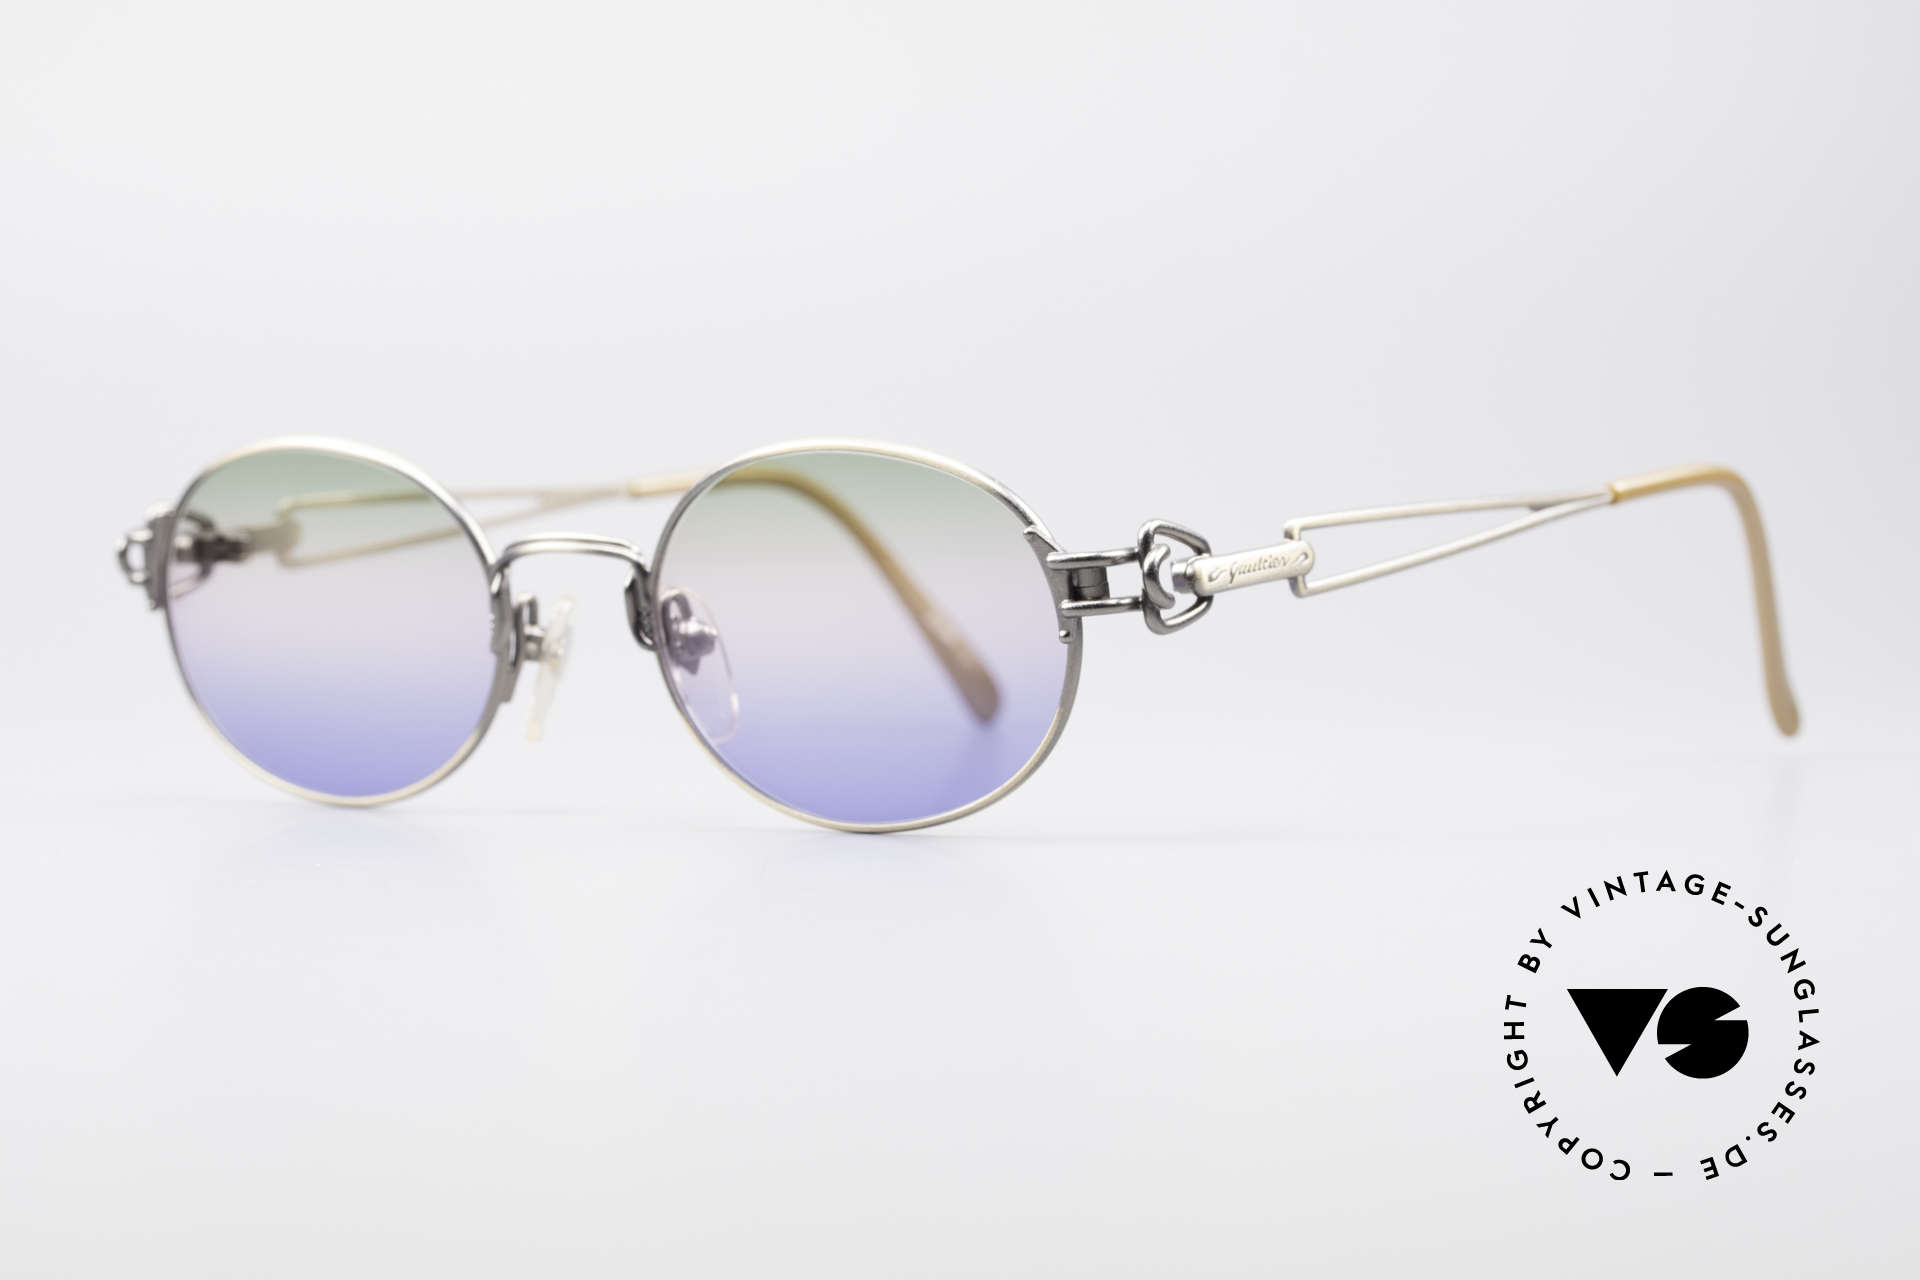 Jean Paul Gaultier 55-6112 JPG Designer Sunglasses, furthermore with unique tricolor-gradient sun lenses, Made for Men and Women